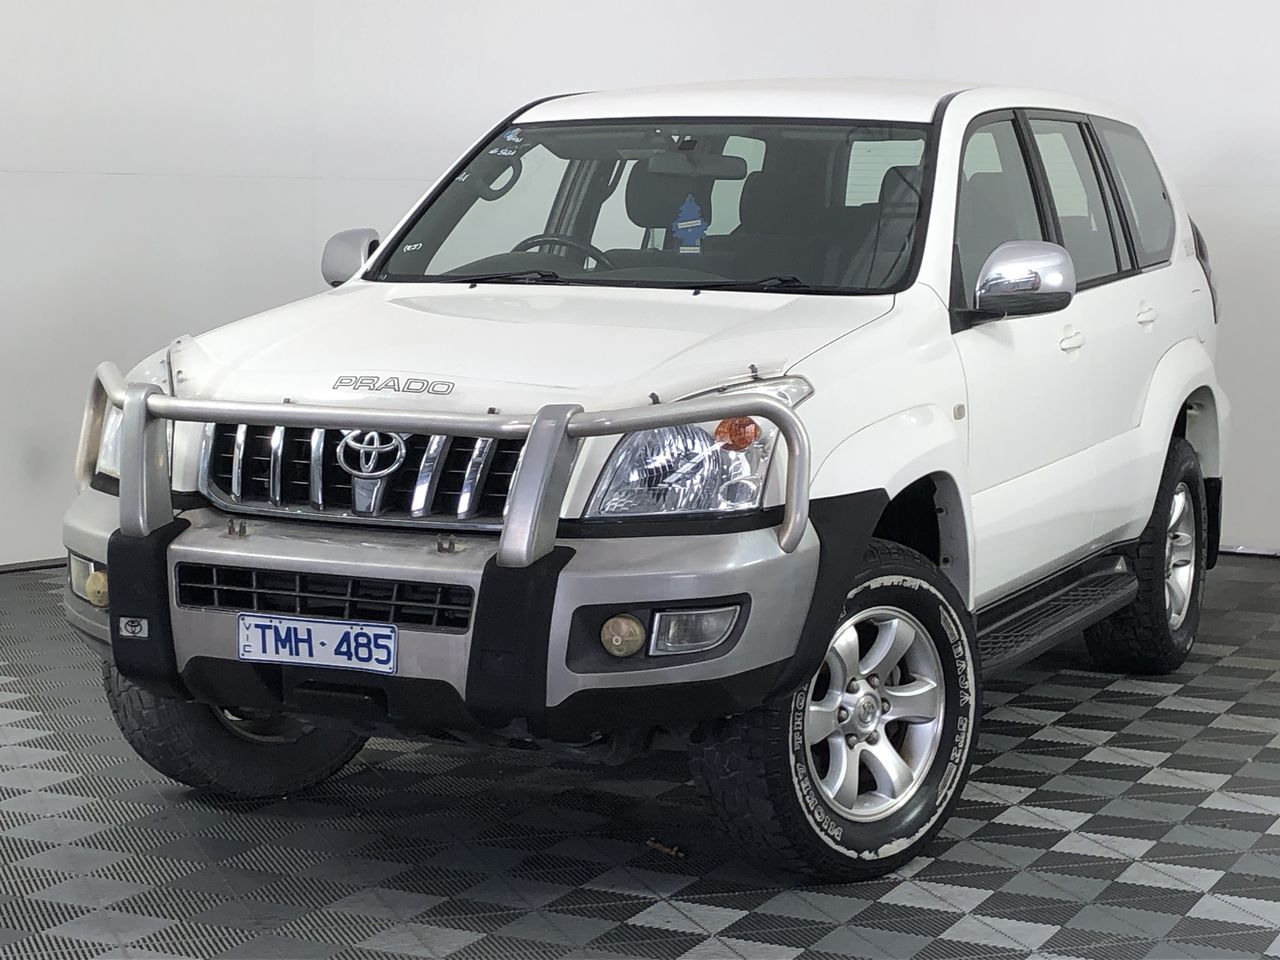 2005 Toyota Landcruiser Prado GXL (4x4) KZJ120R Turbo Diesel 8 Seats